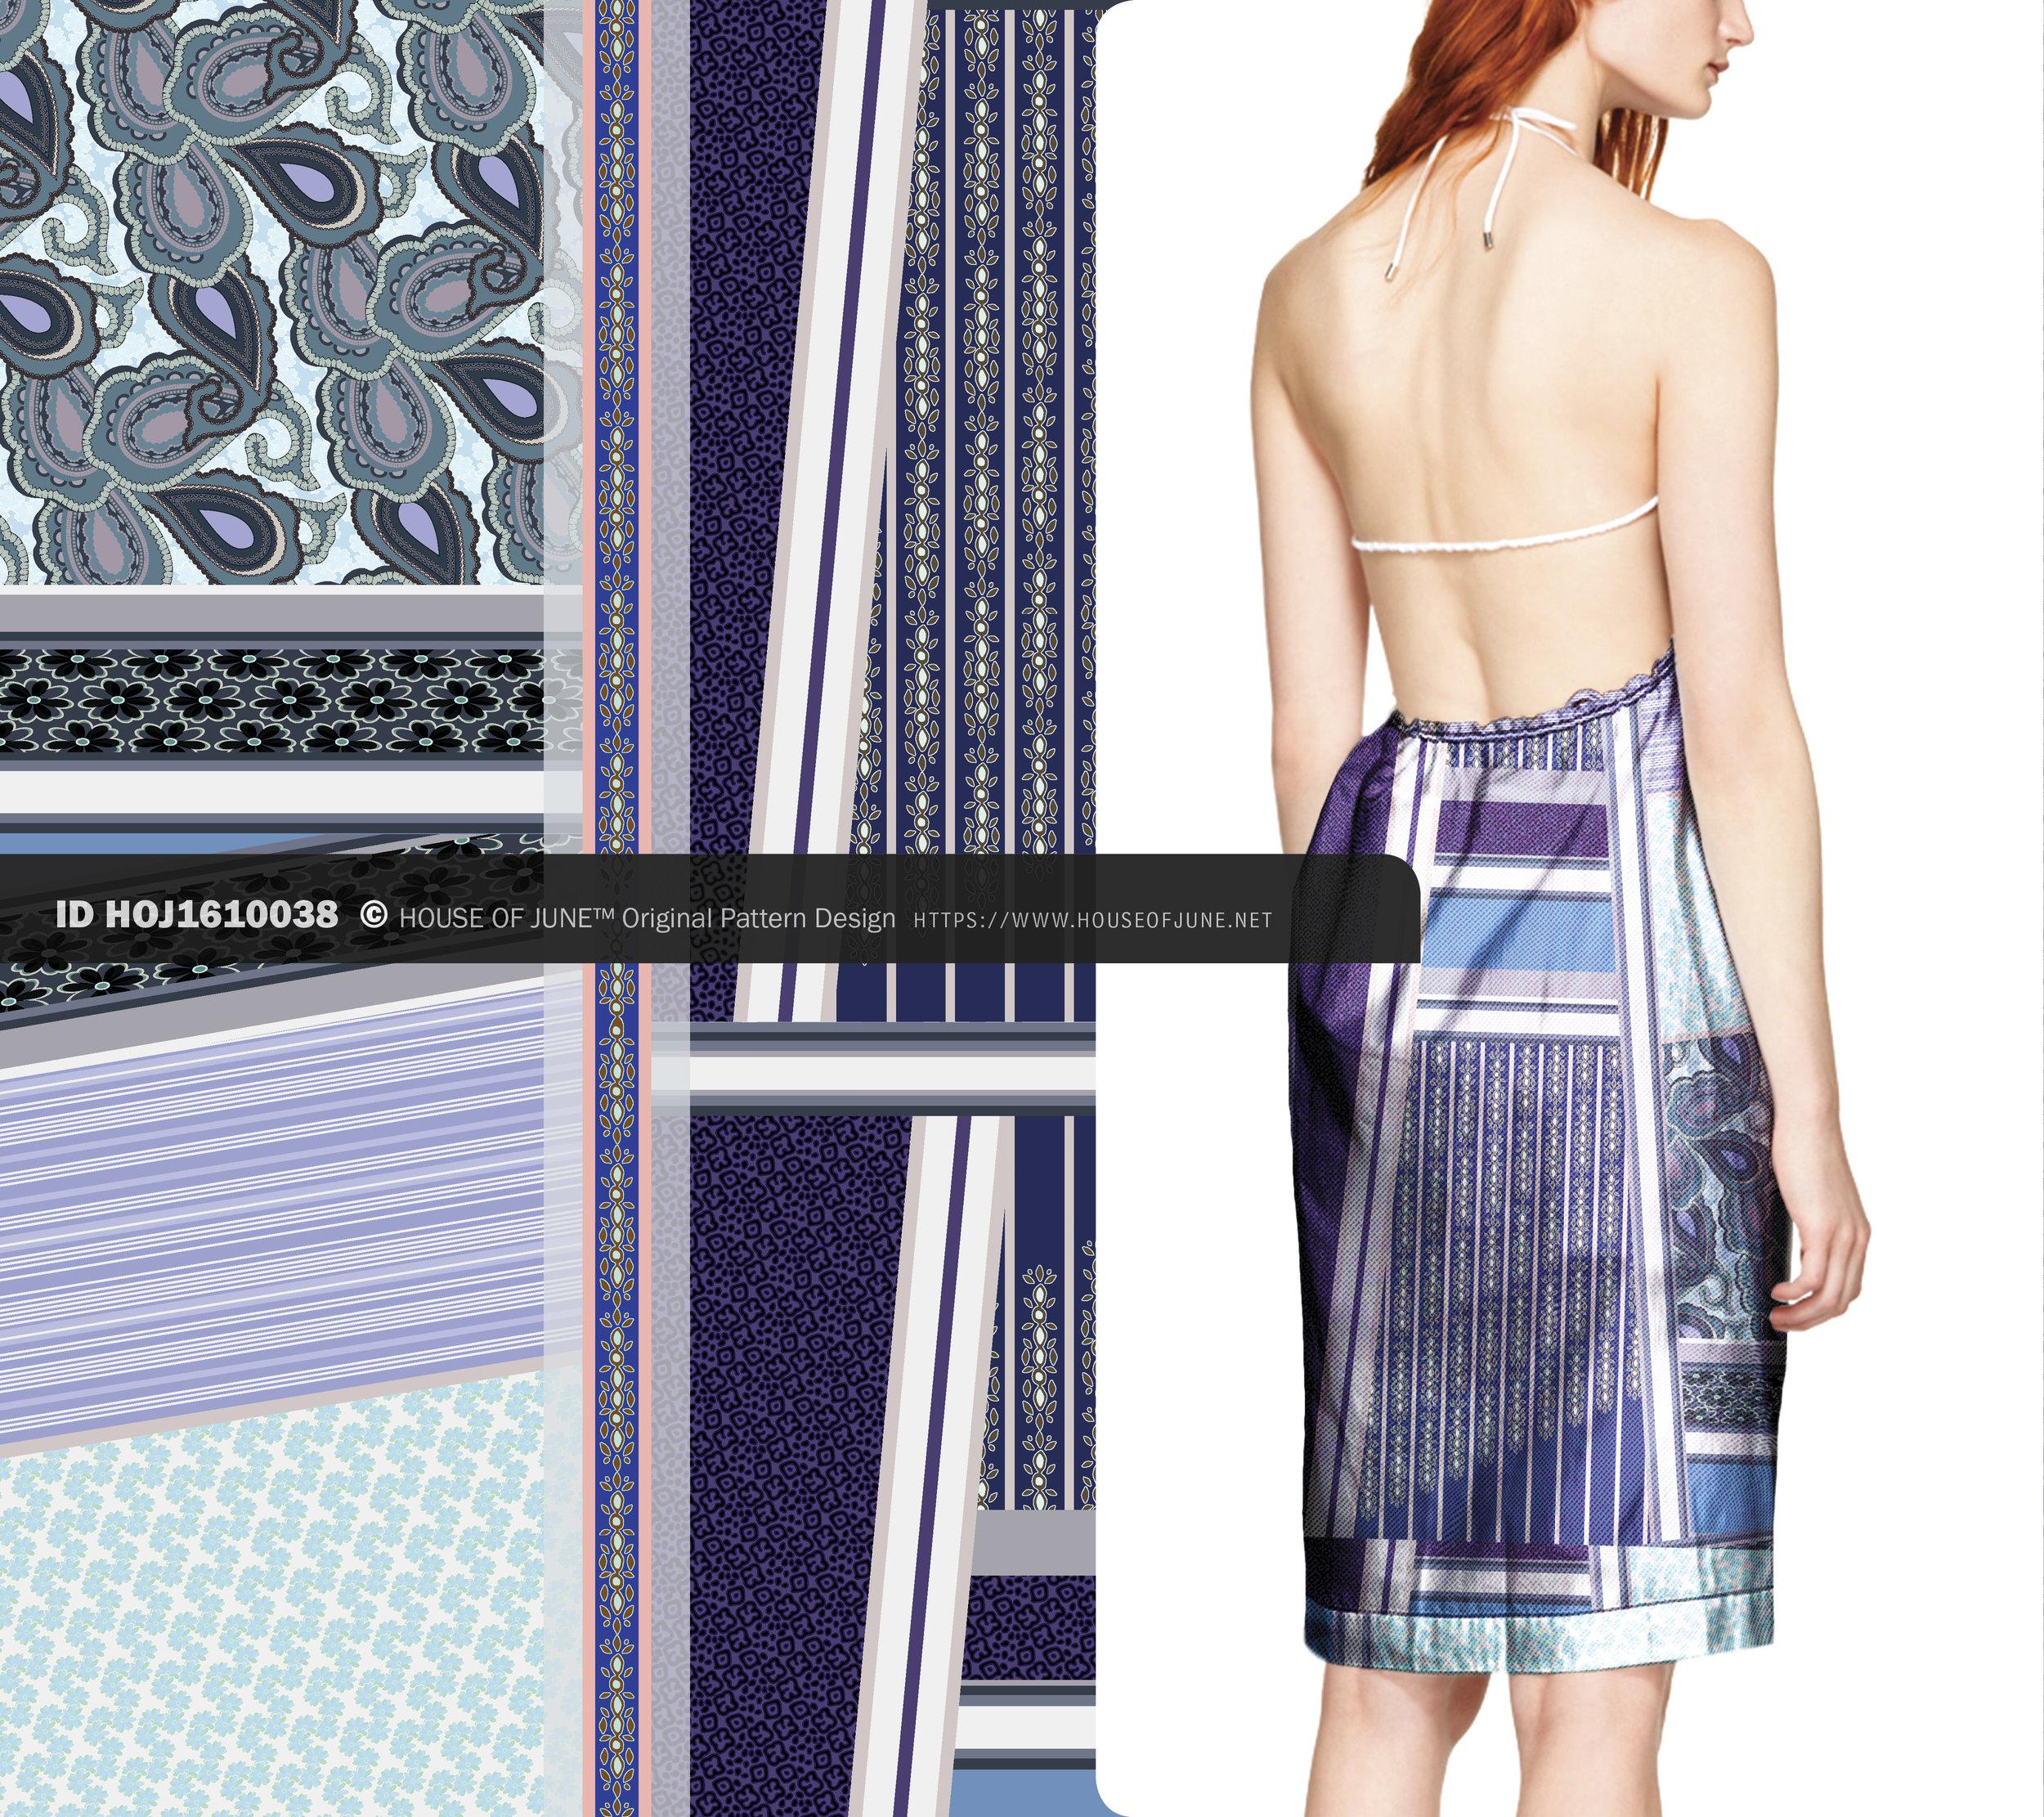 HOUSE OF JUNE™ original textile print pattern design artwork